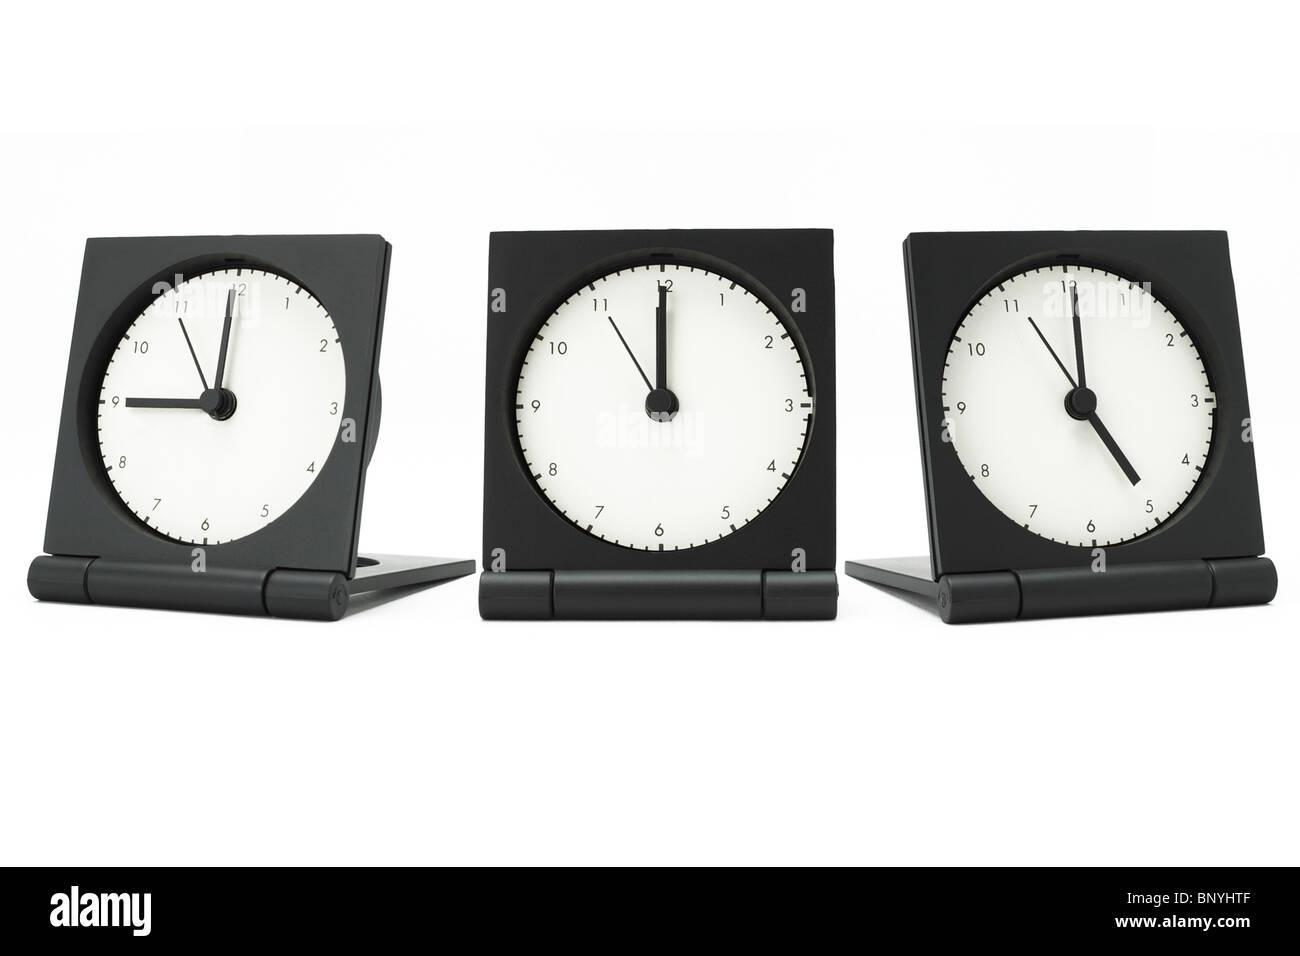 Desktop alarm clocks showing 9 am to 5 pm on white background - Stock Image